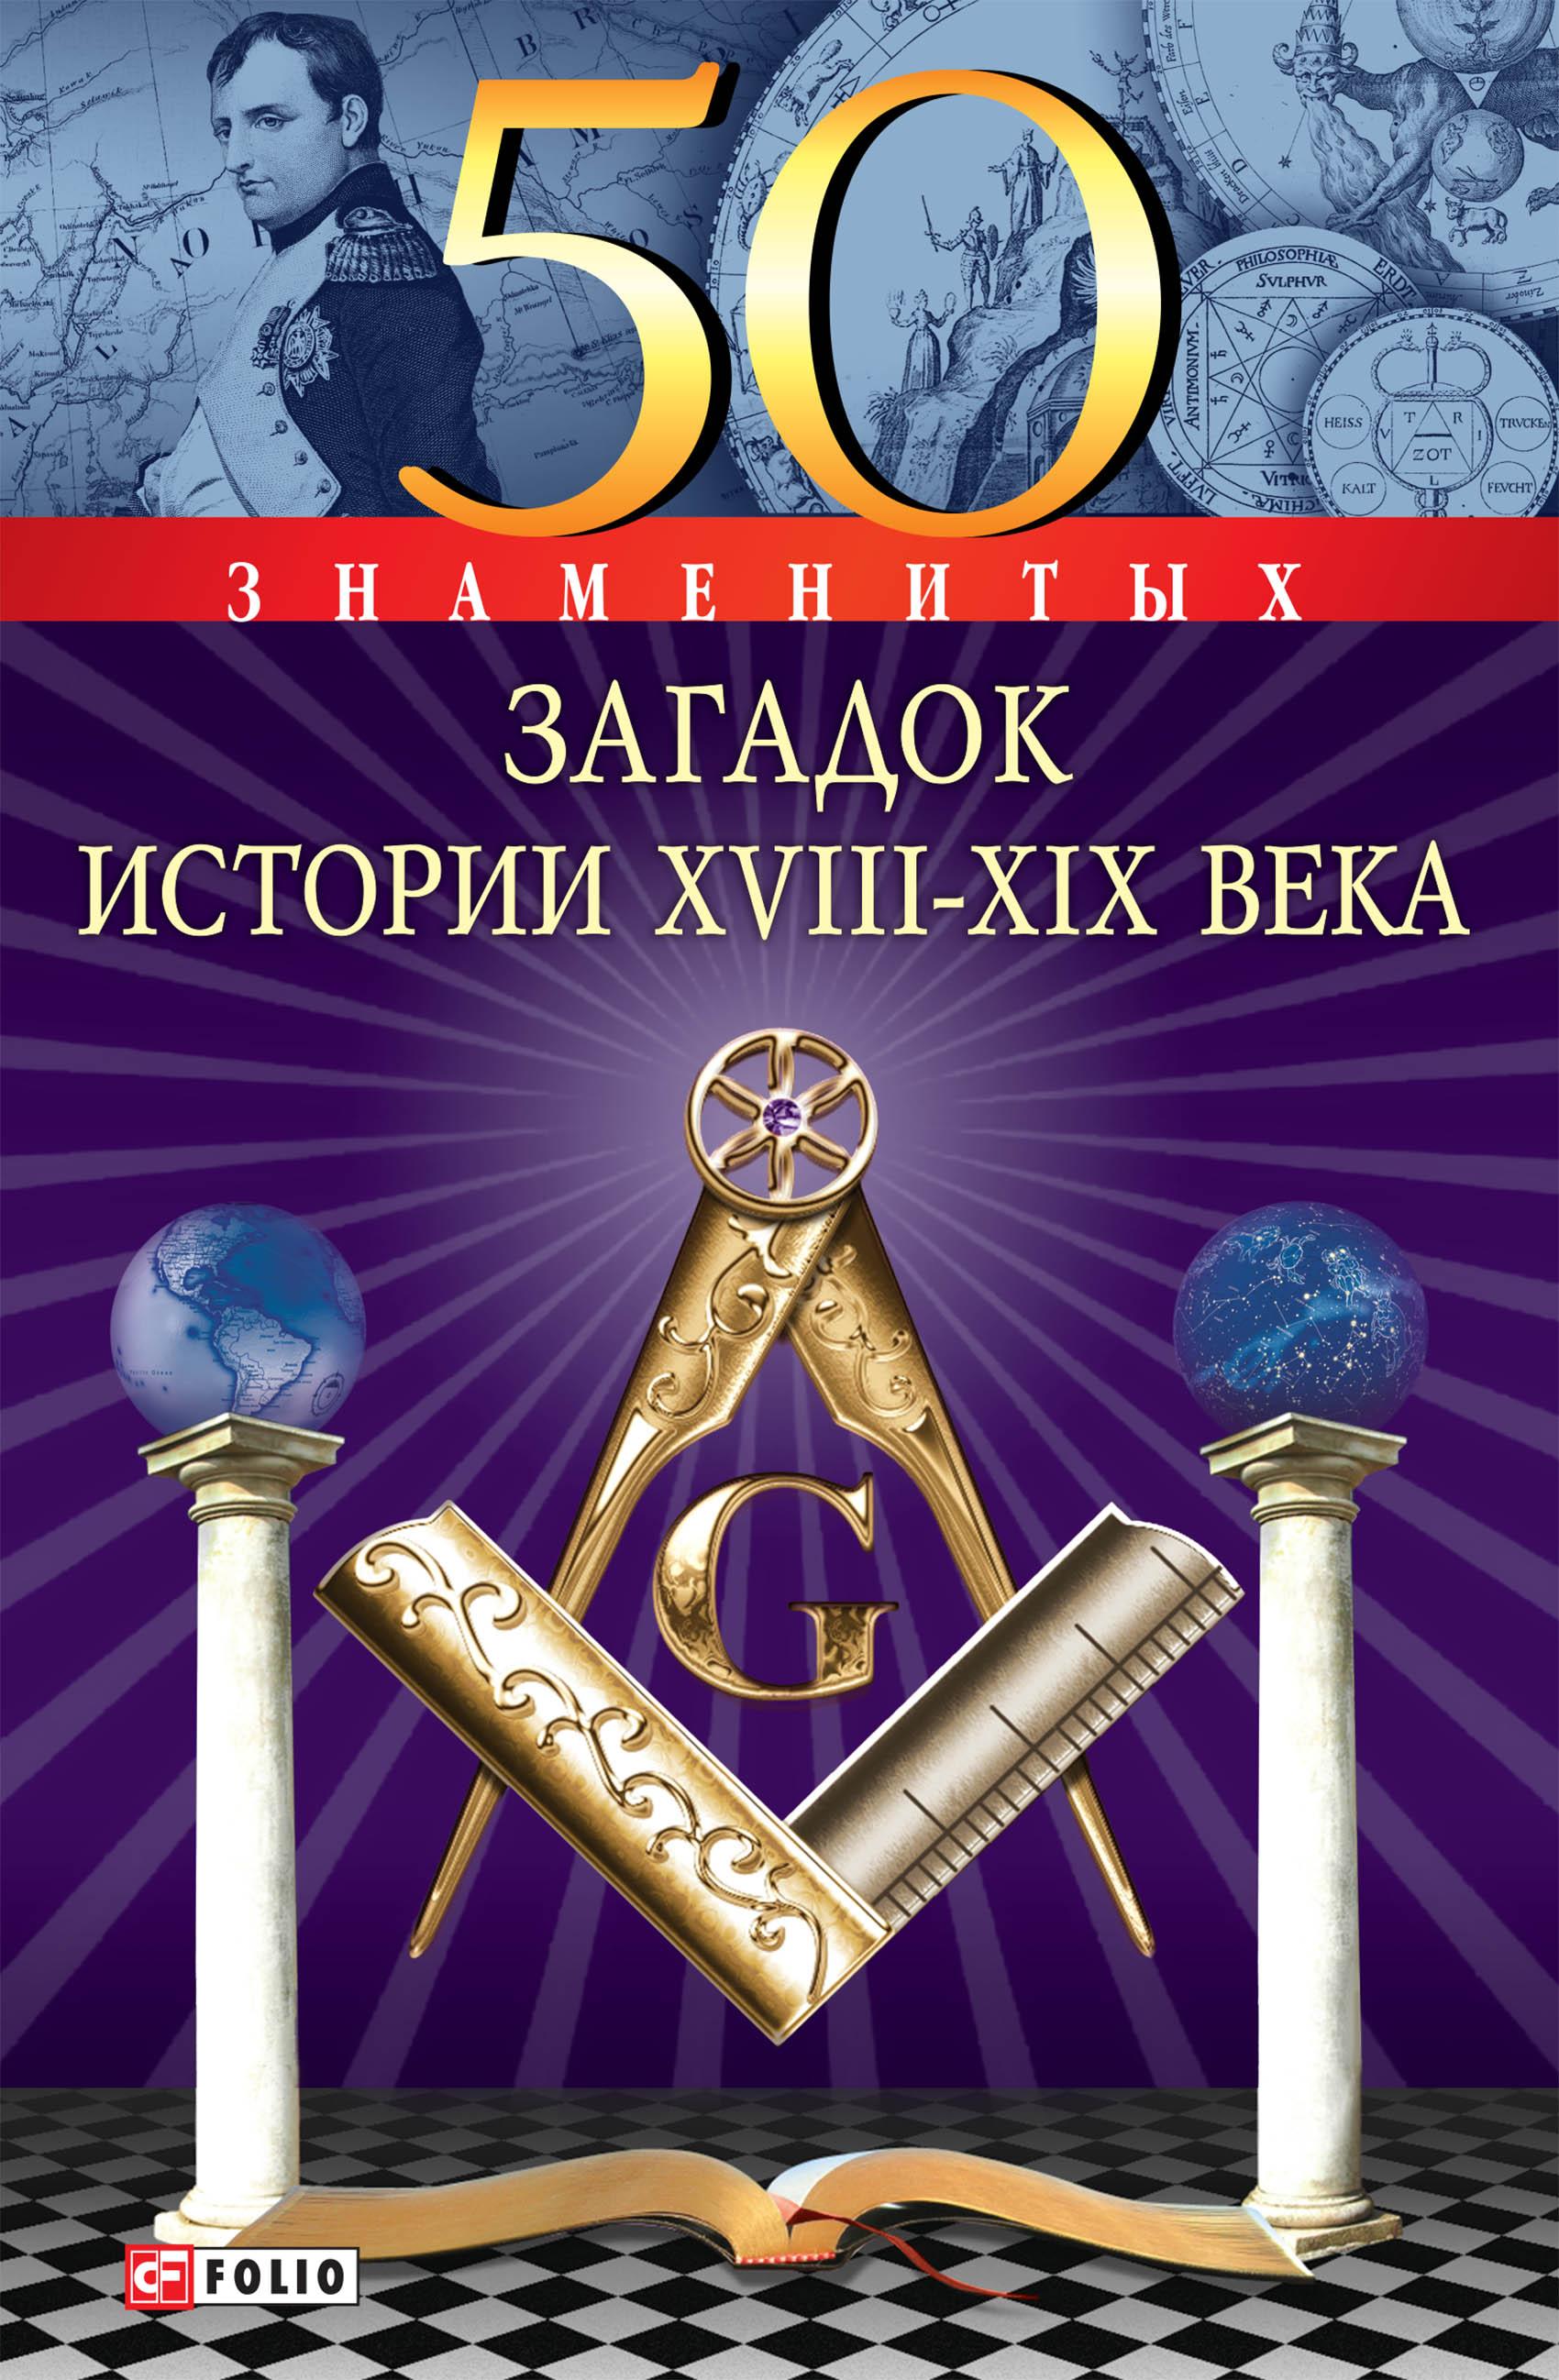 Володимир Сядро 50 знаменитых загадок истории ХVIII-ХIХ веков